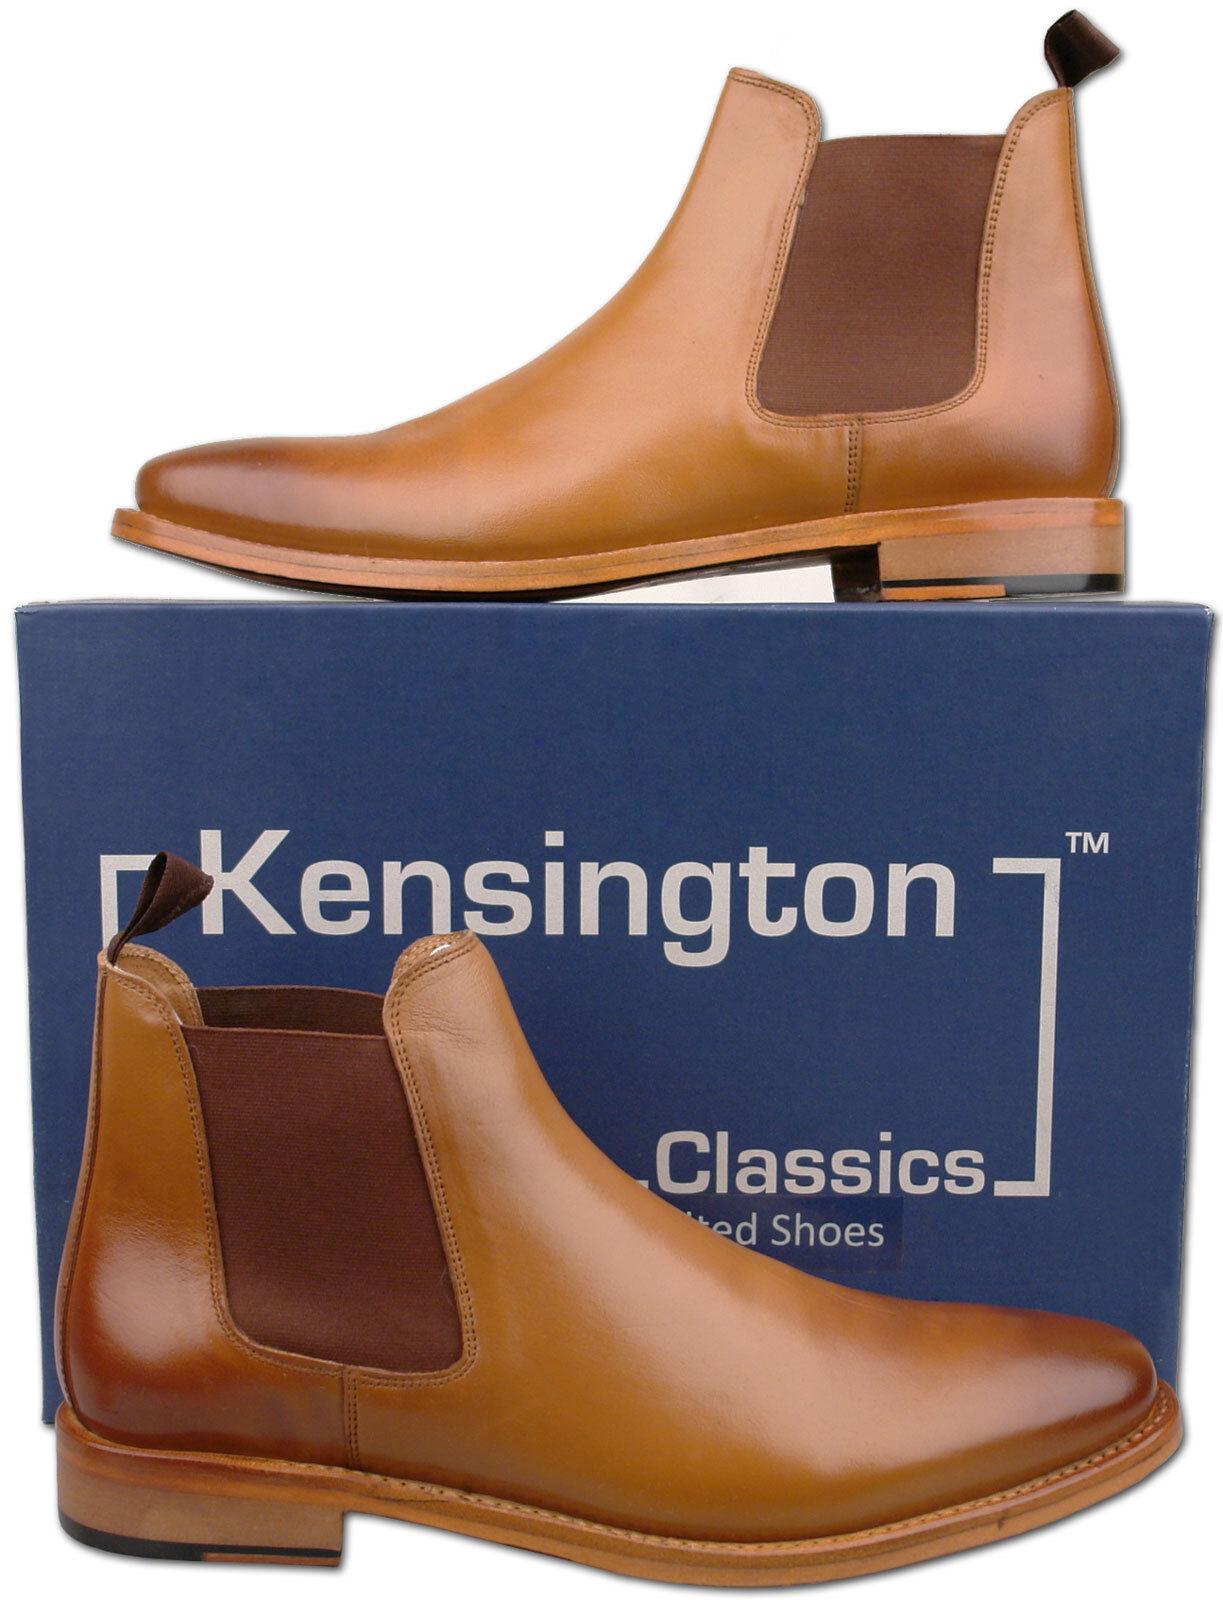 Herren New Tan Tan Tan Full Leder Chelsea Fashion Ankle Stiefel Größe 7 8 9 10 11 12 1524b7